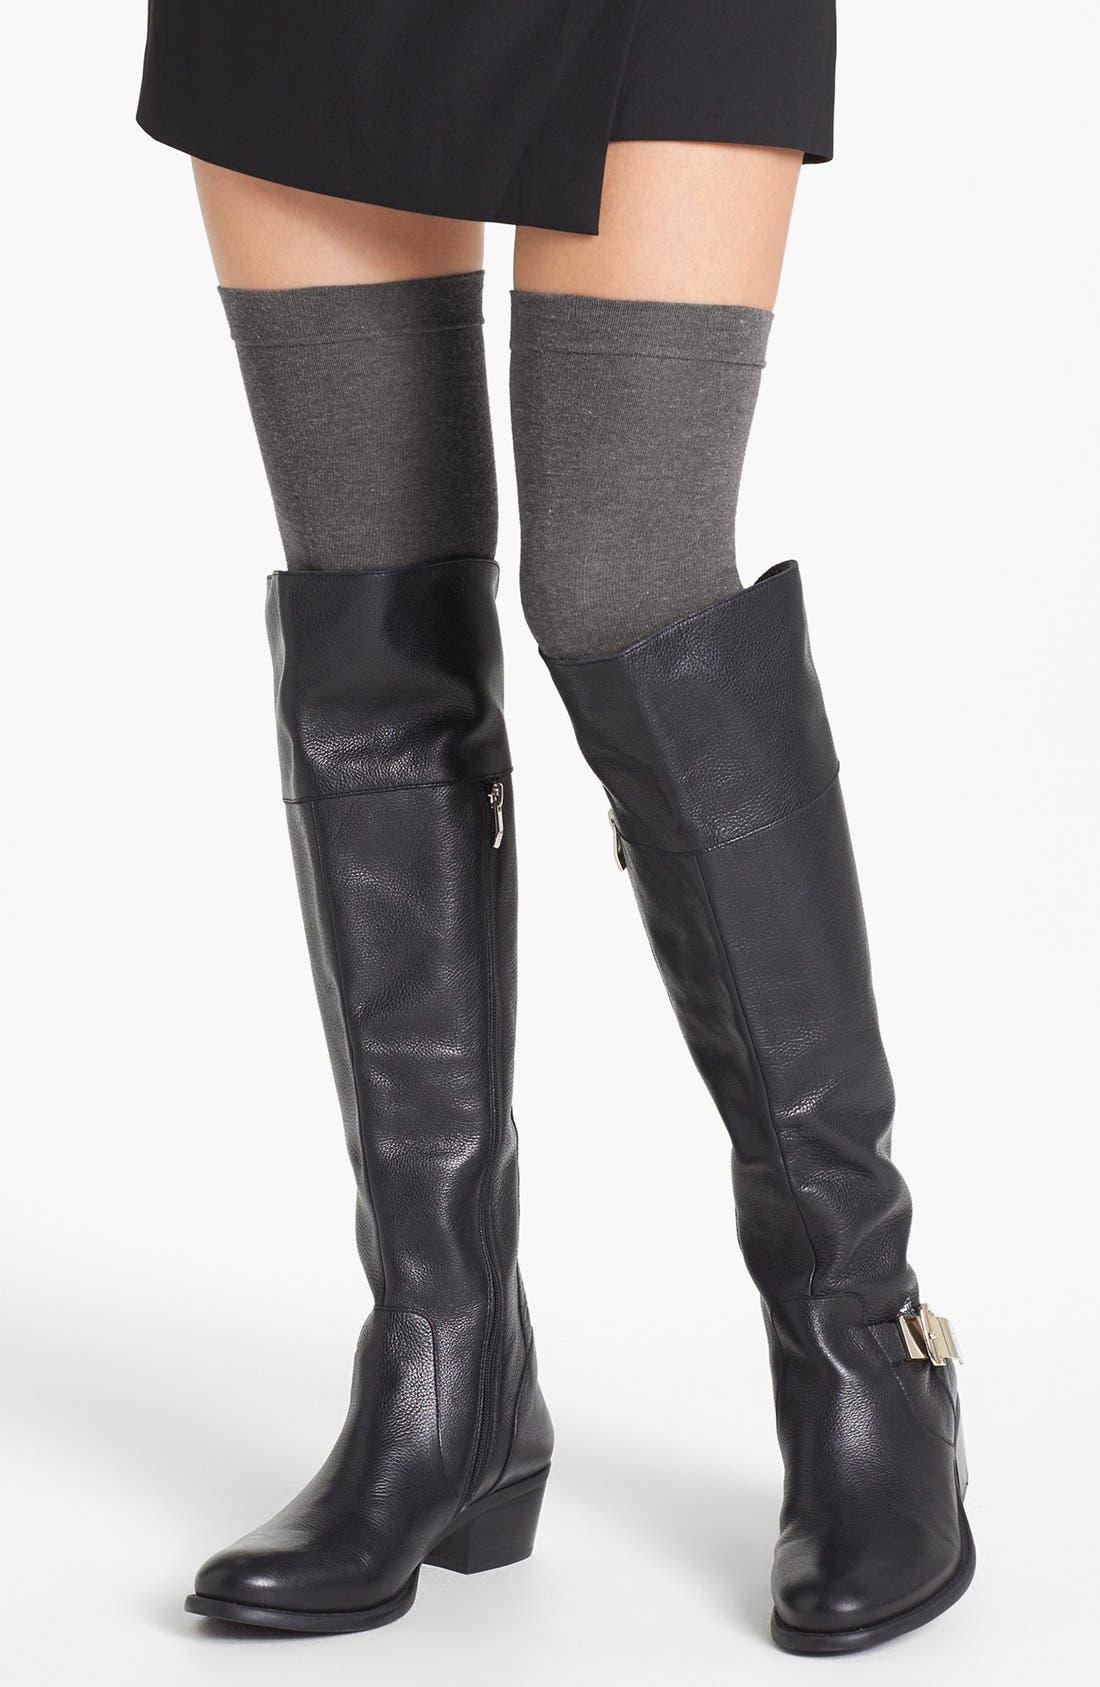 Alternate Image 1 Selected - Hue 'Tall & Skinny' Over the Knee Socks